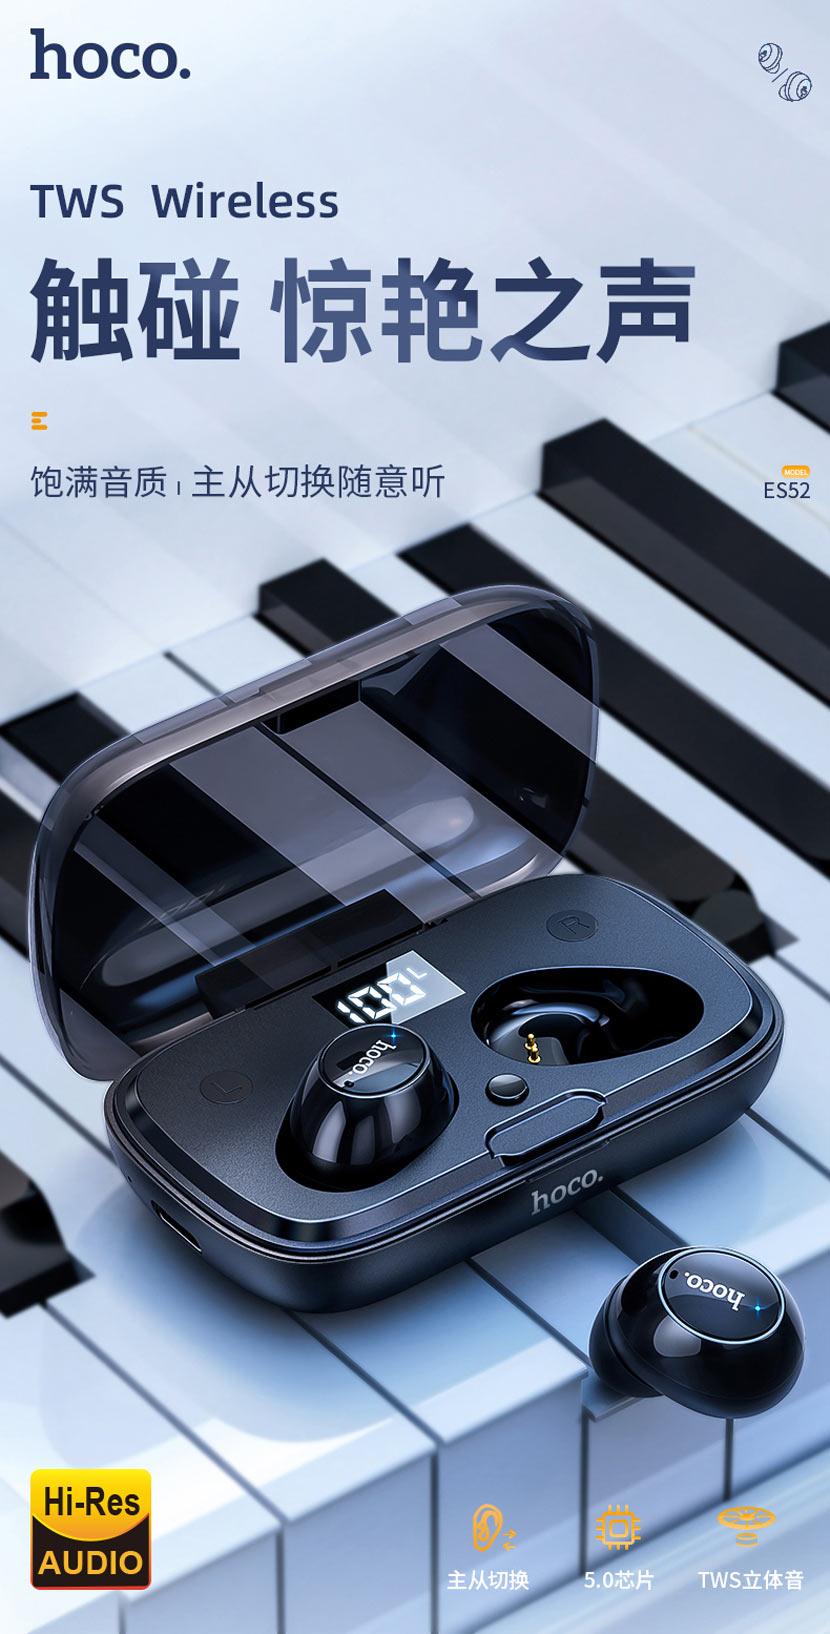 hoco news es52 delight tws wireless bt headset cn